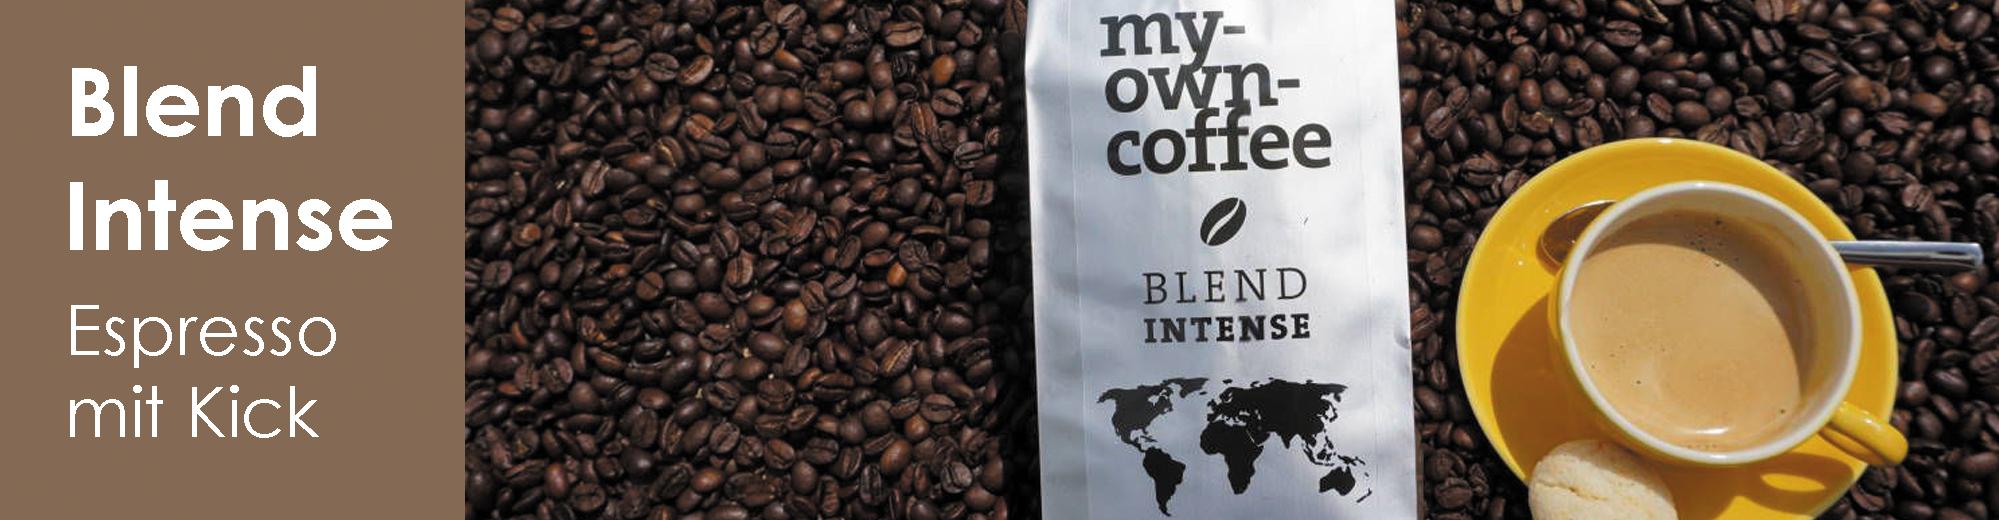 BEND Intense Espresso